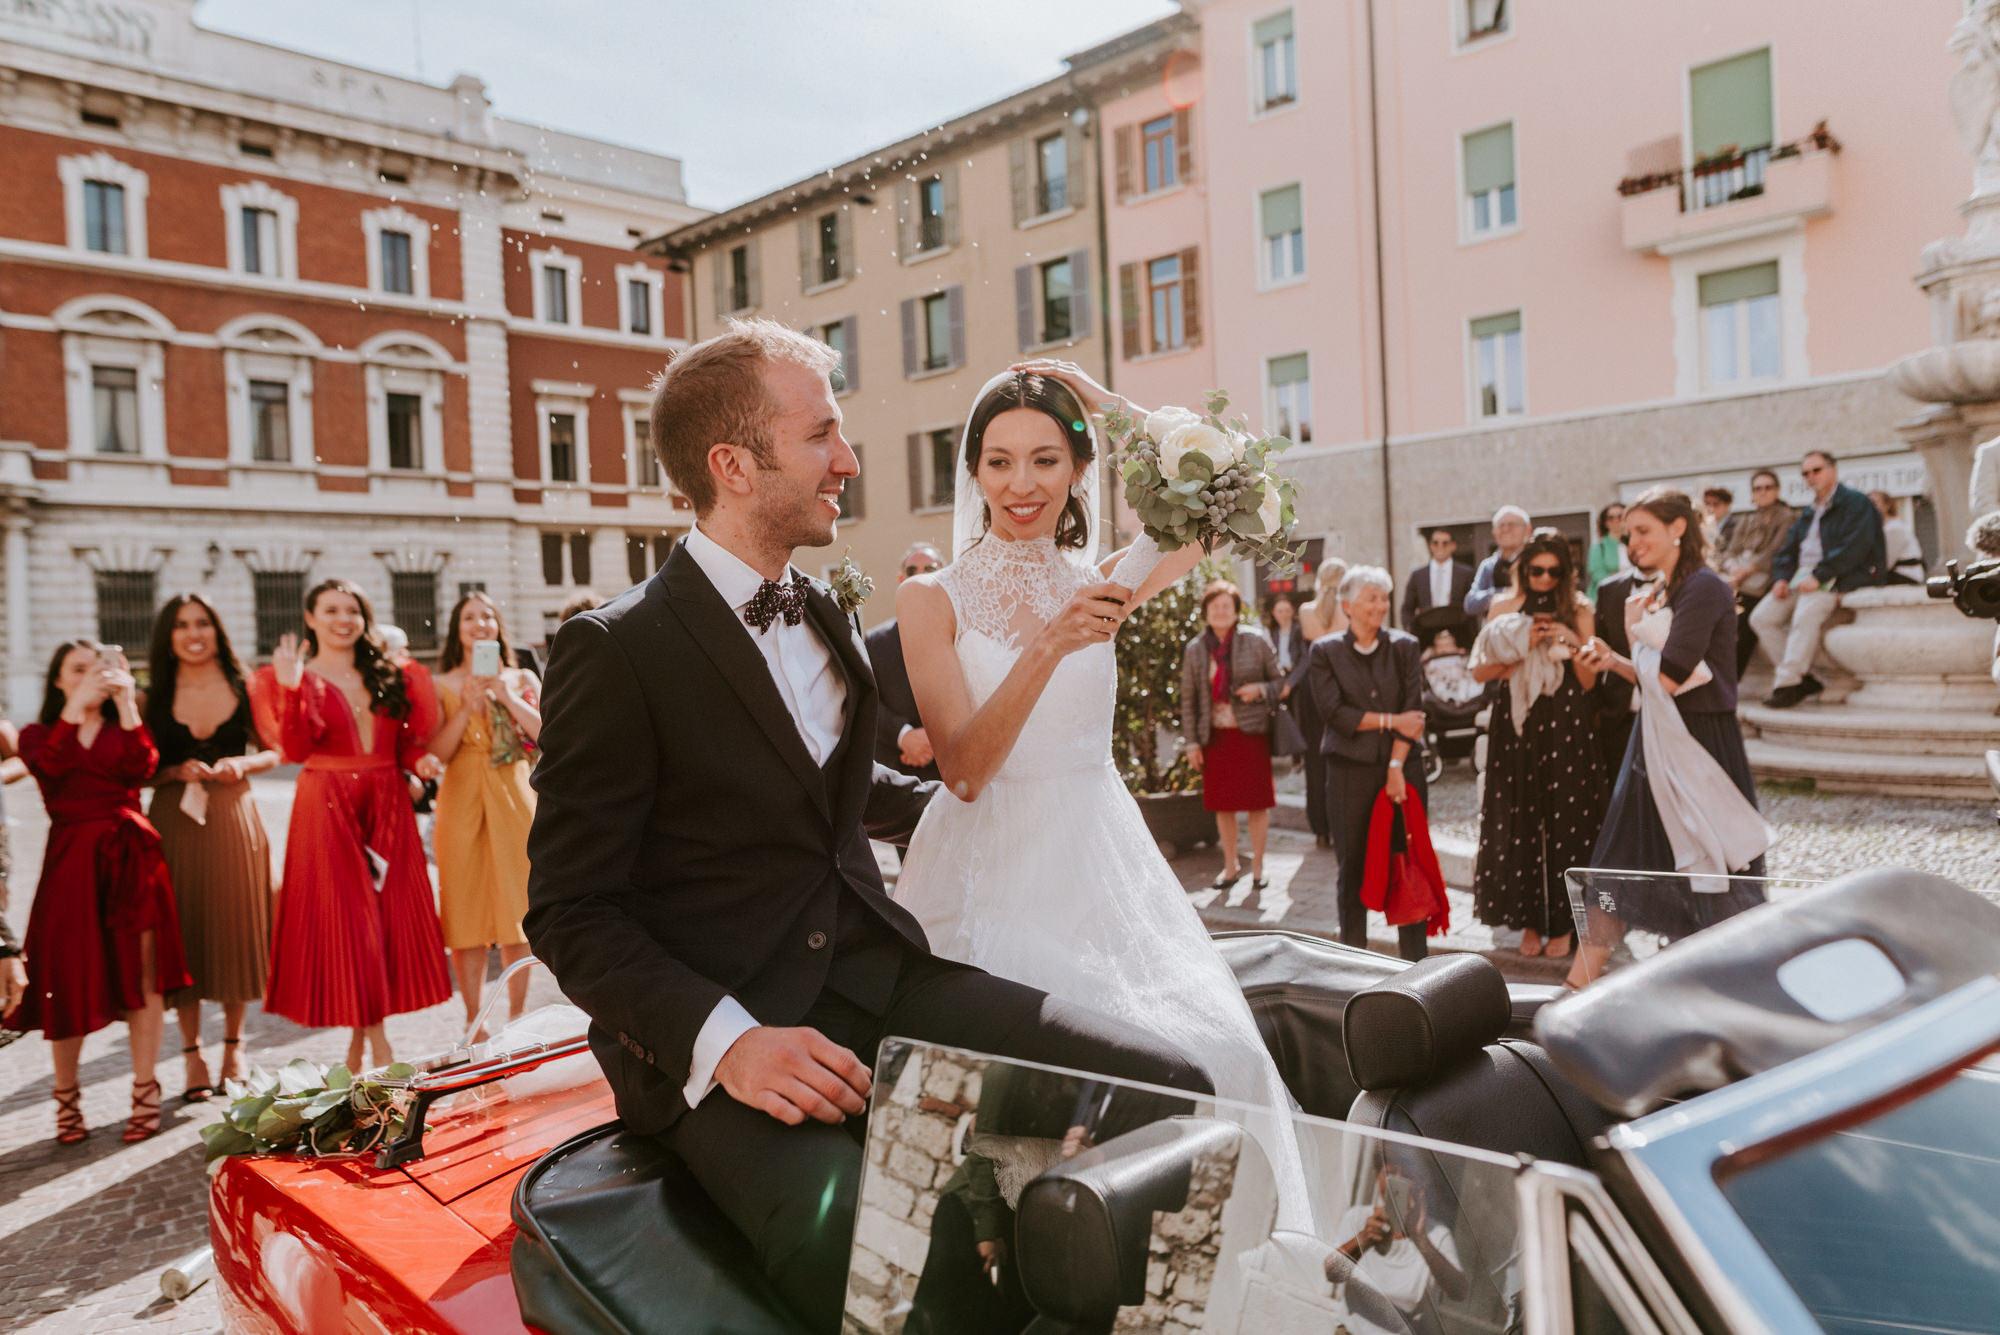 FOTO+PHOTO+BODA+WEDDING+ITALIA+ITALY+MAURICIO+GARAY+MAURICIOGARAY+WEDDINPHOTOGRAPHER+FOTOGRAFODEBODA-1100.jpg